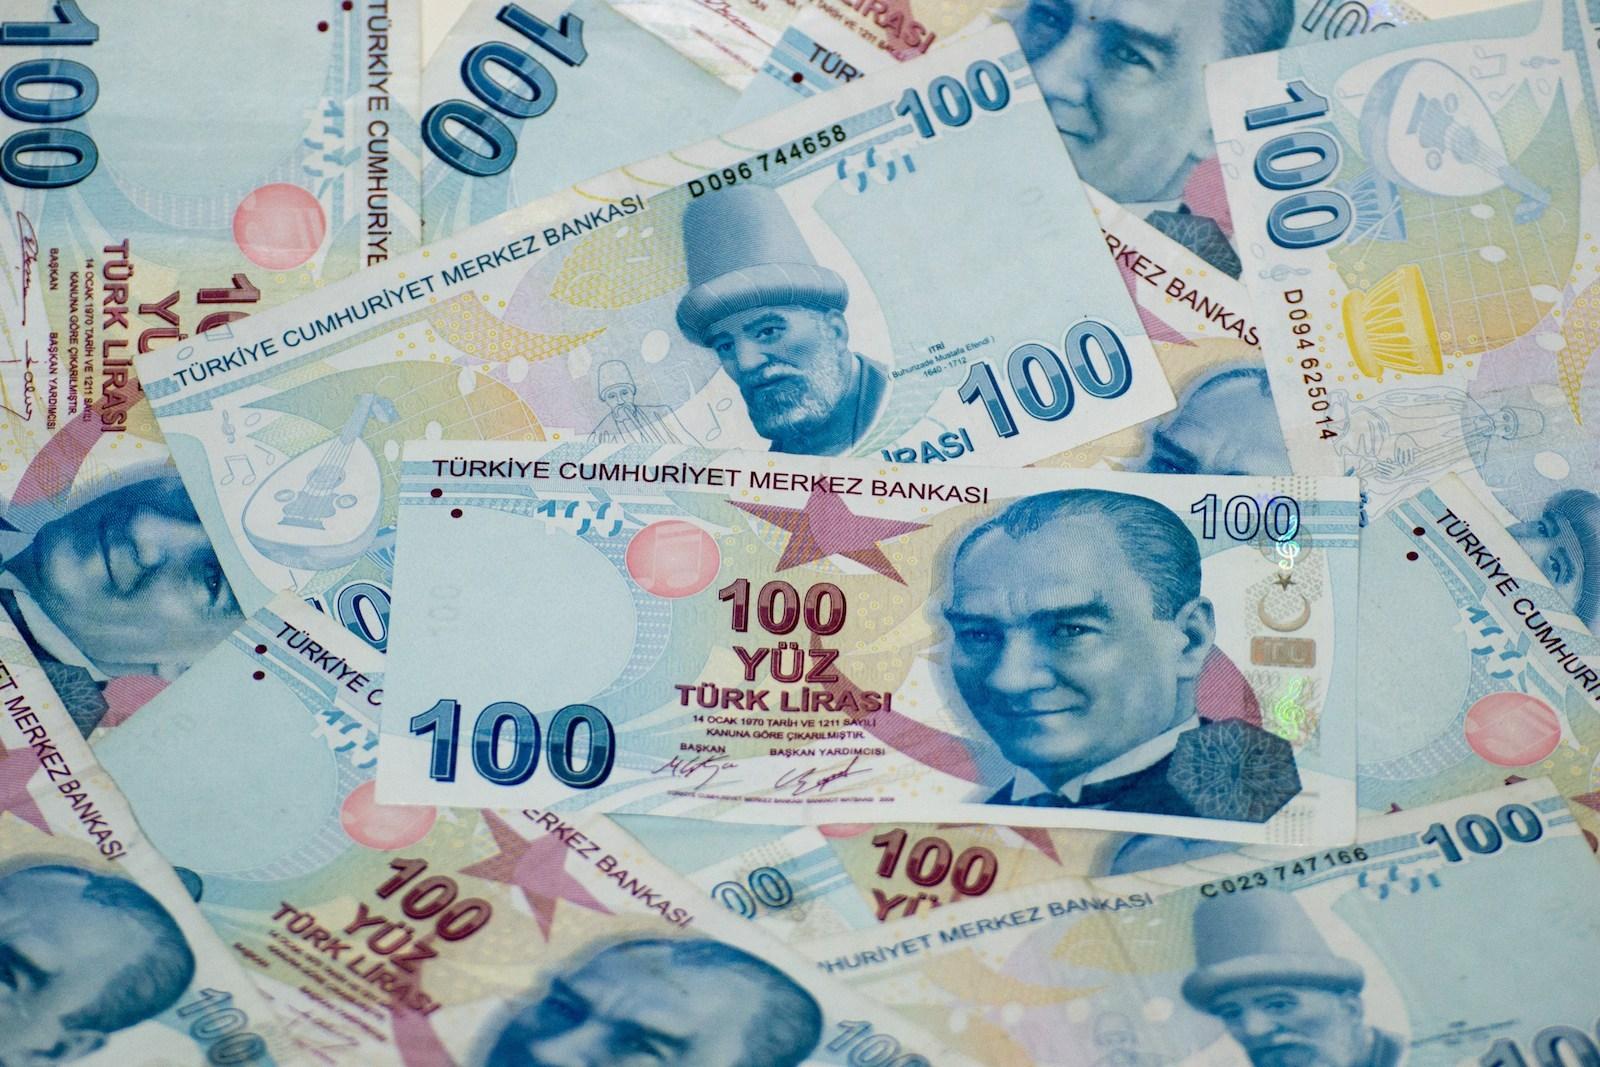 Turkish lira drops 17% as central bank boss sacked